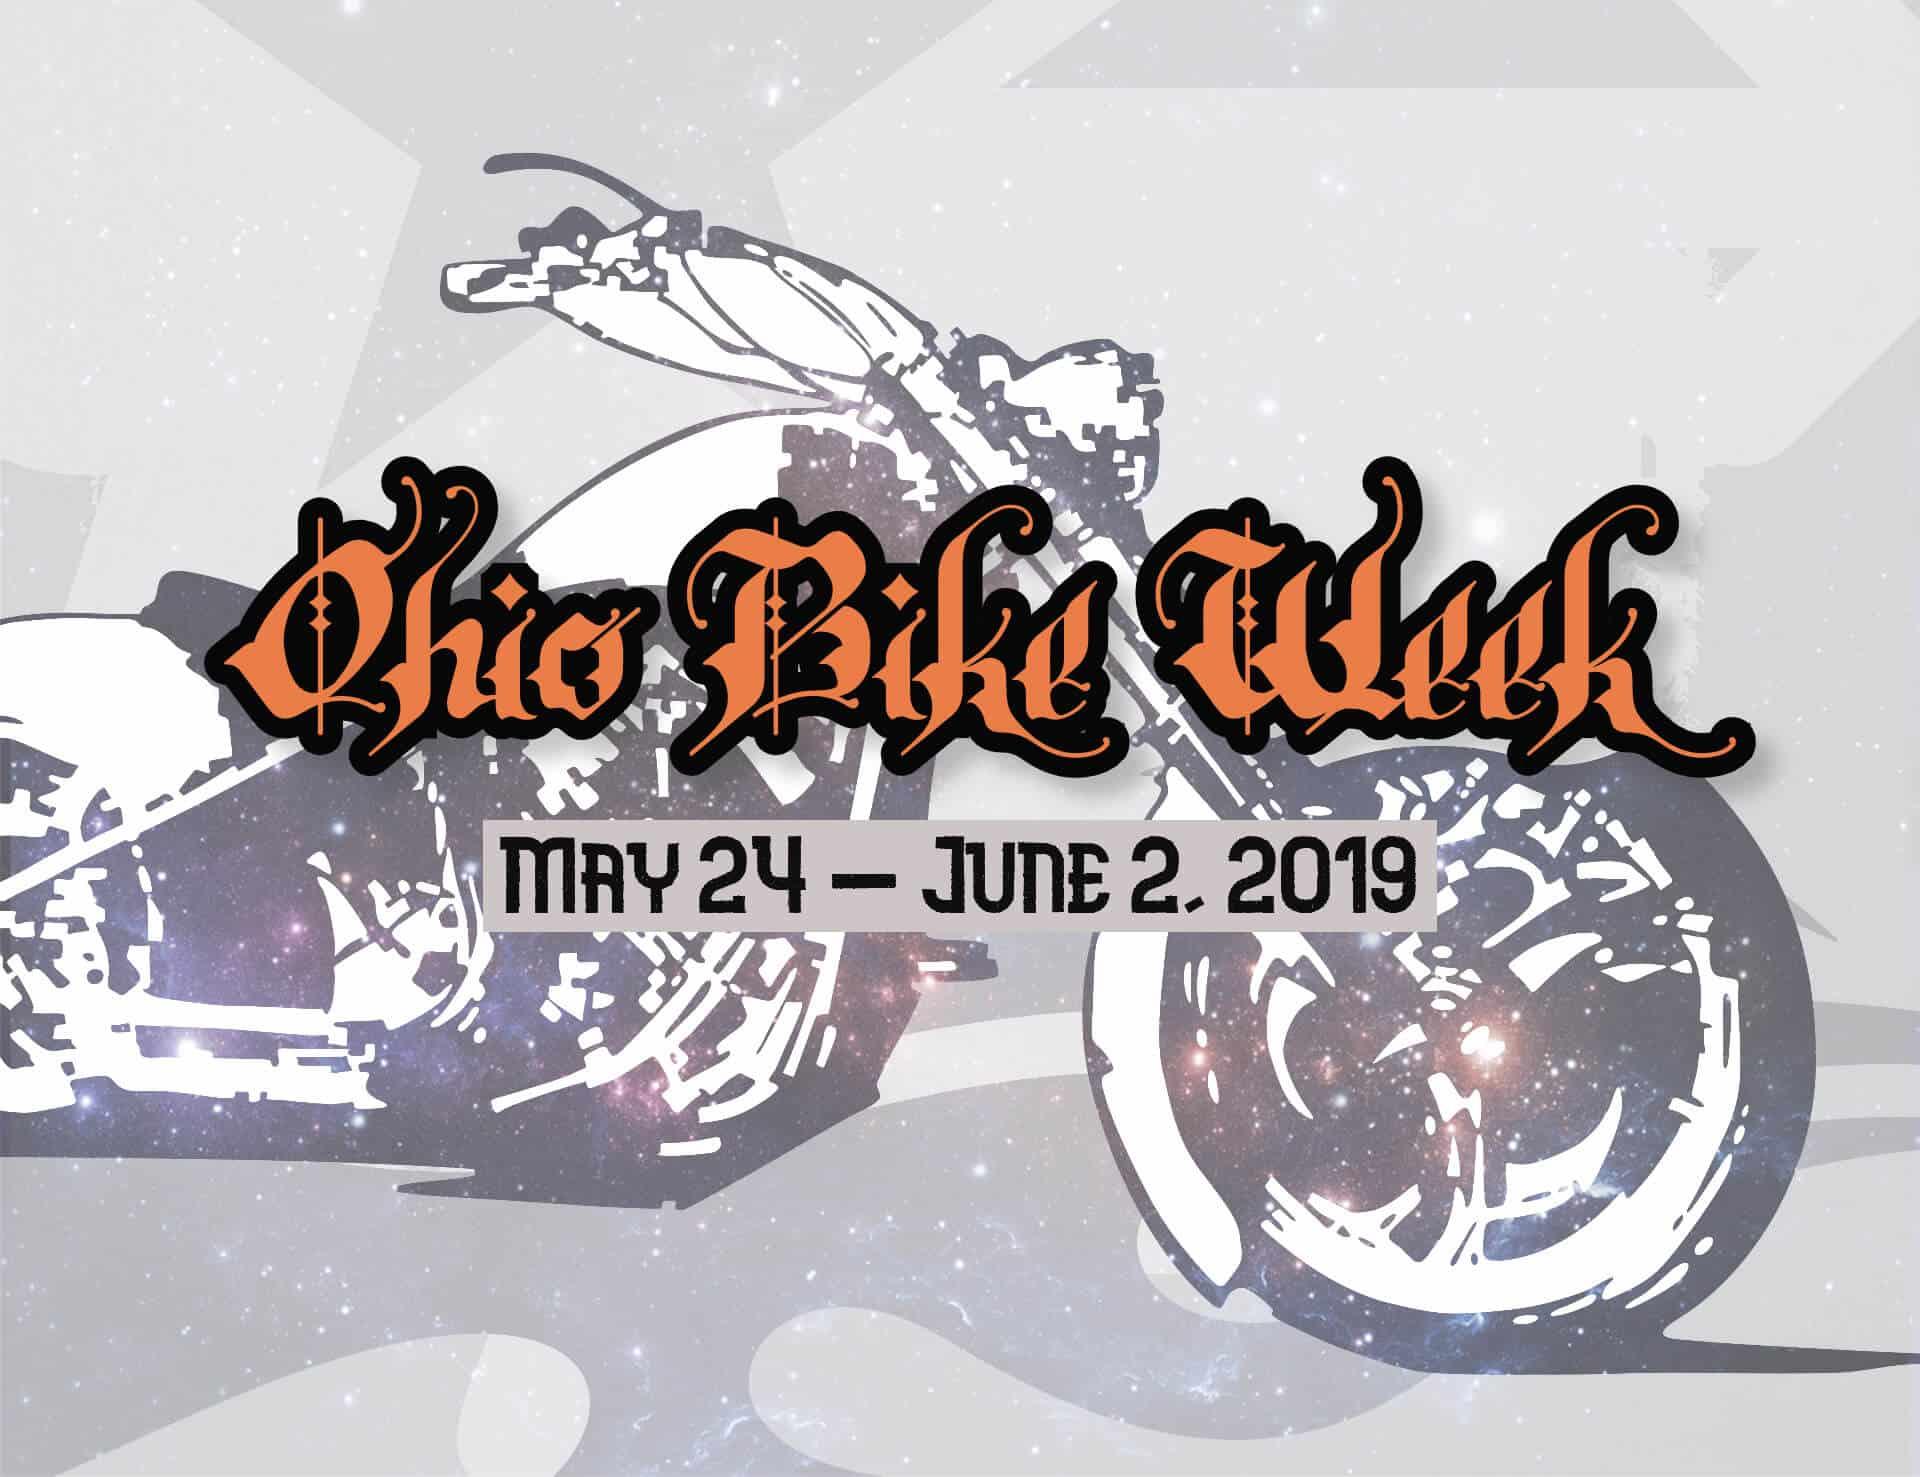 Stylized motorcycle on background of Ohio Bike Week May 24 - June 2, 2019